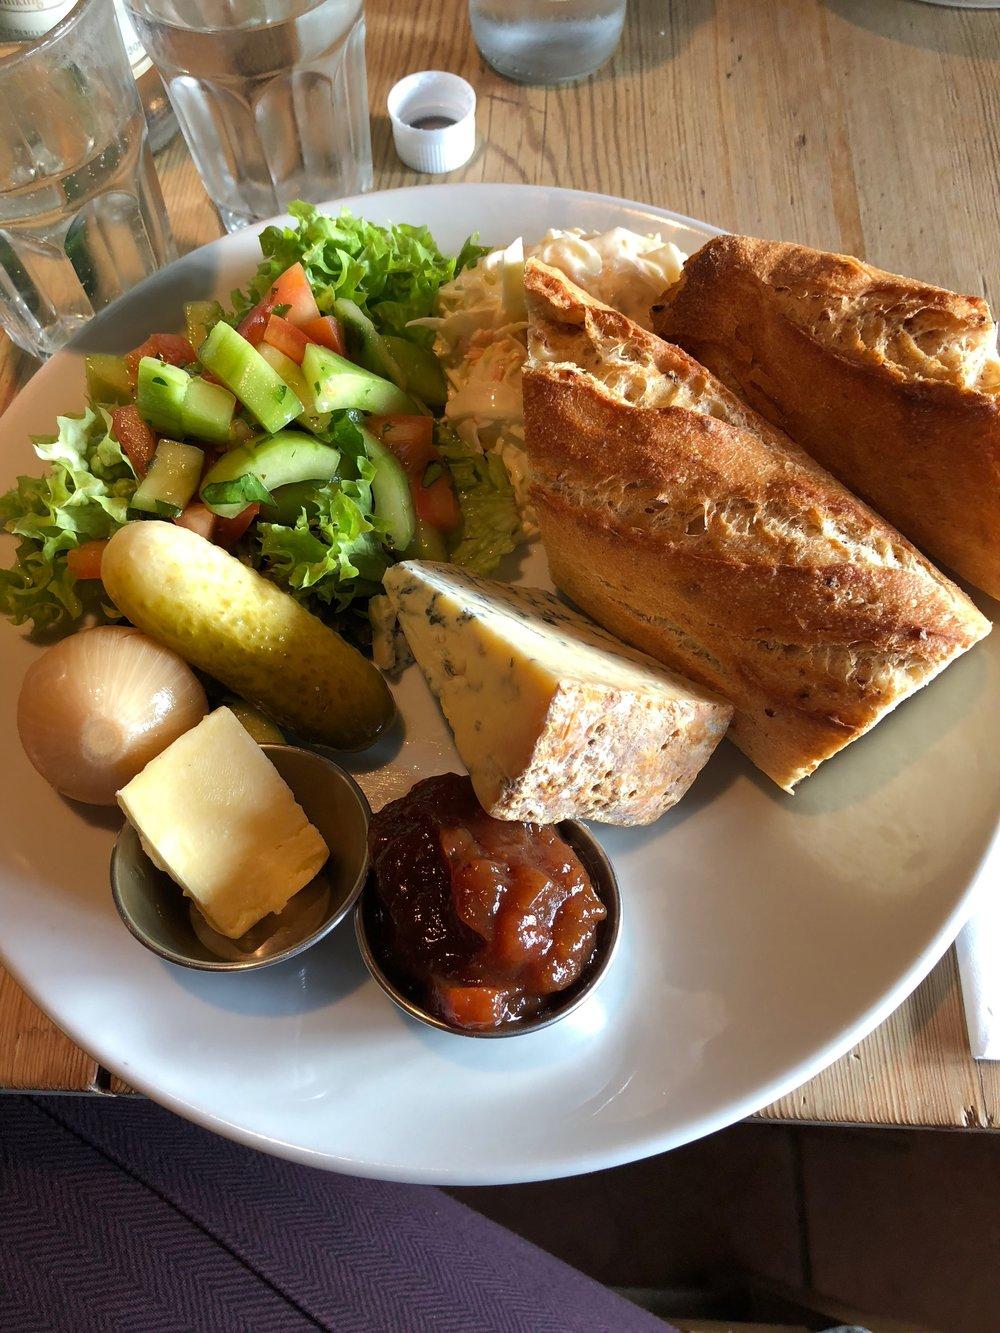 Ploughman's: bread, chutney, butter, stilton, pickled onion, pickled pickle, salad, coleslaw